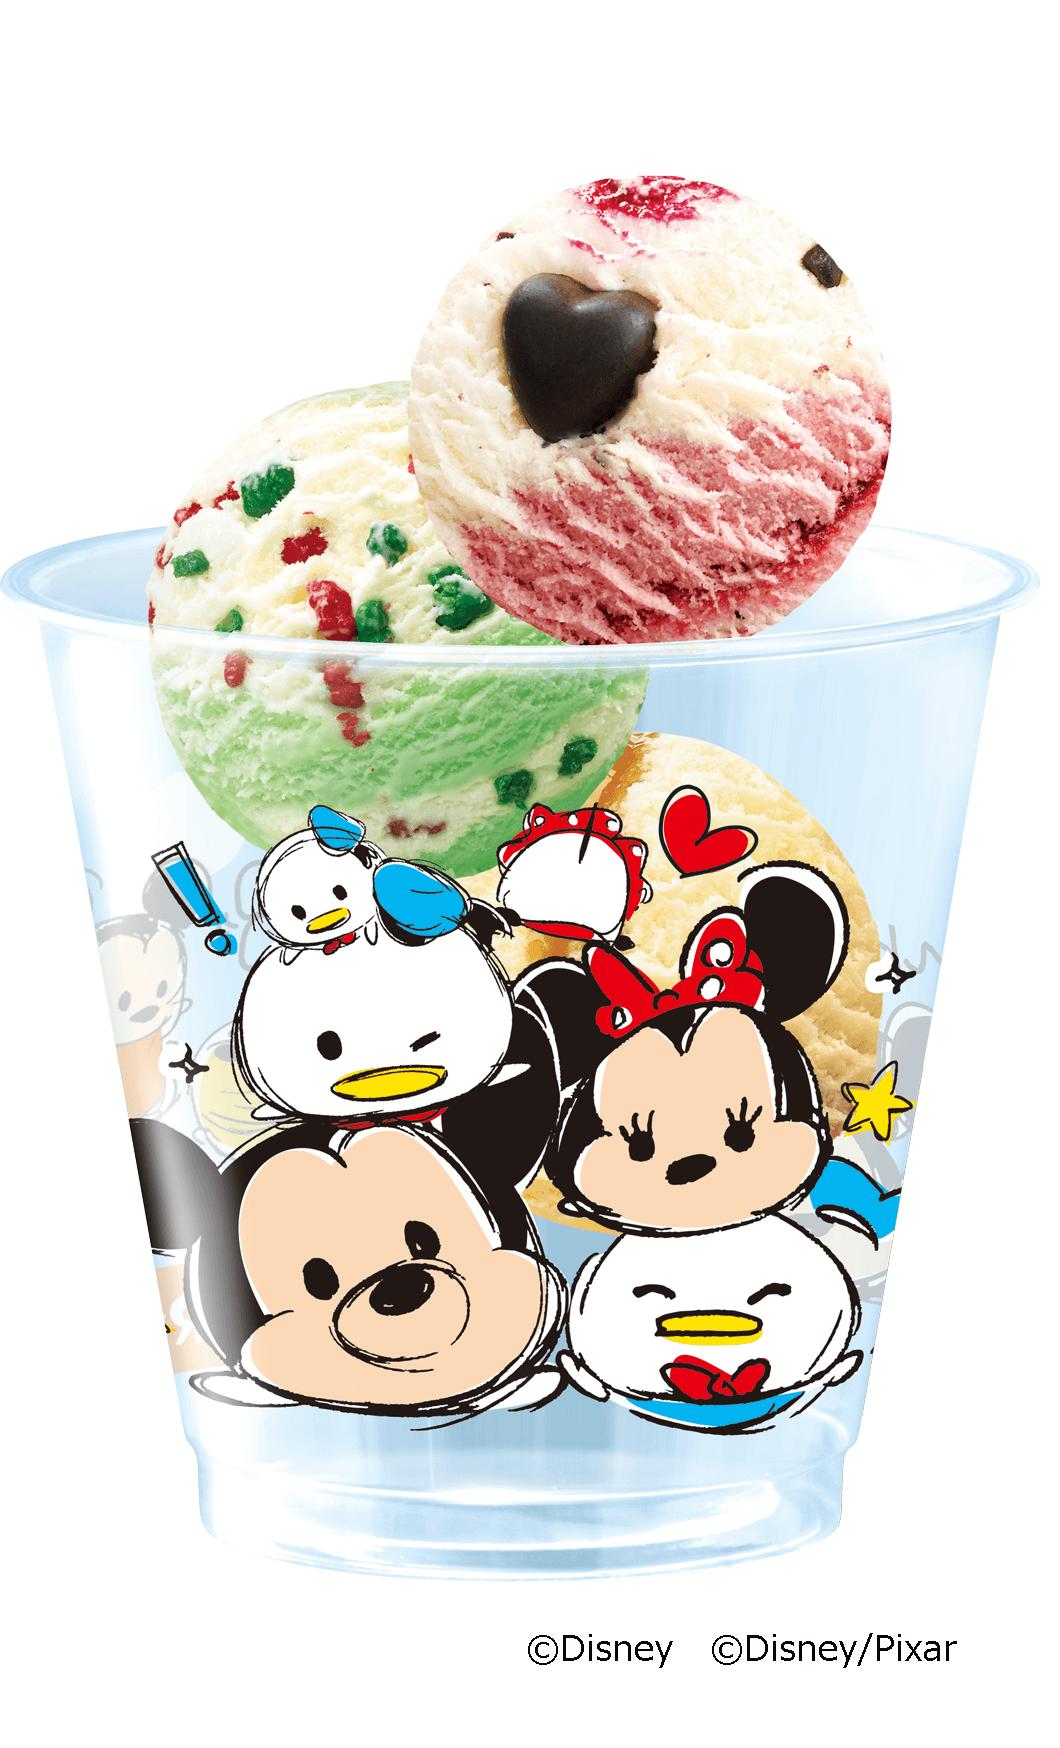 b%e2%80%90r-%e3%82%b5%e3%83%bc%e3%83%86%e3%82%a3%e3%83%af%e3%83%b3-%e3%82%a2%e3%82%a4%e3%82%b9%e3%82%af%e3%83%aa%e3%83%bc%e3%83%a0-br-31-ice-cream-%e3%80%8ctsum-tsum-%e3%83%88